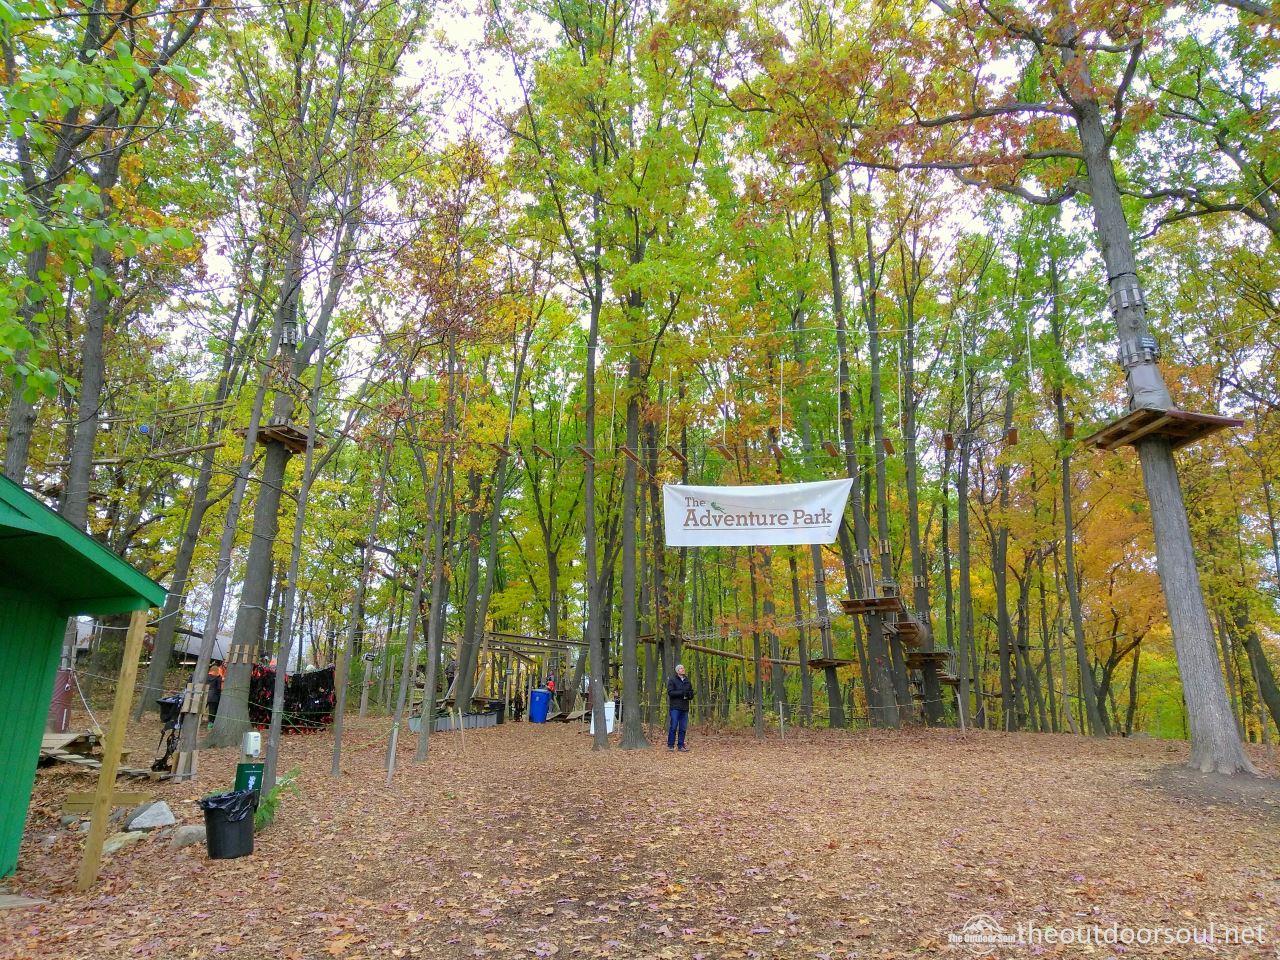 adventure park west bloomfield entrance sign